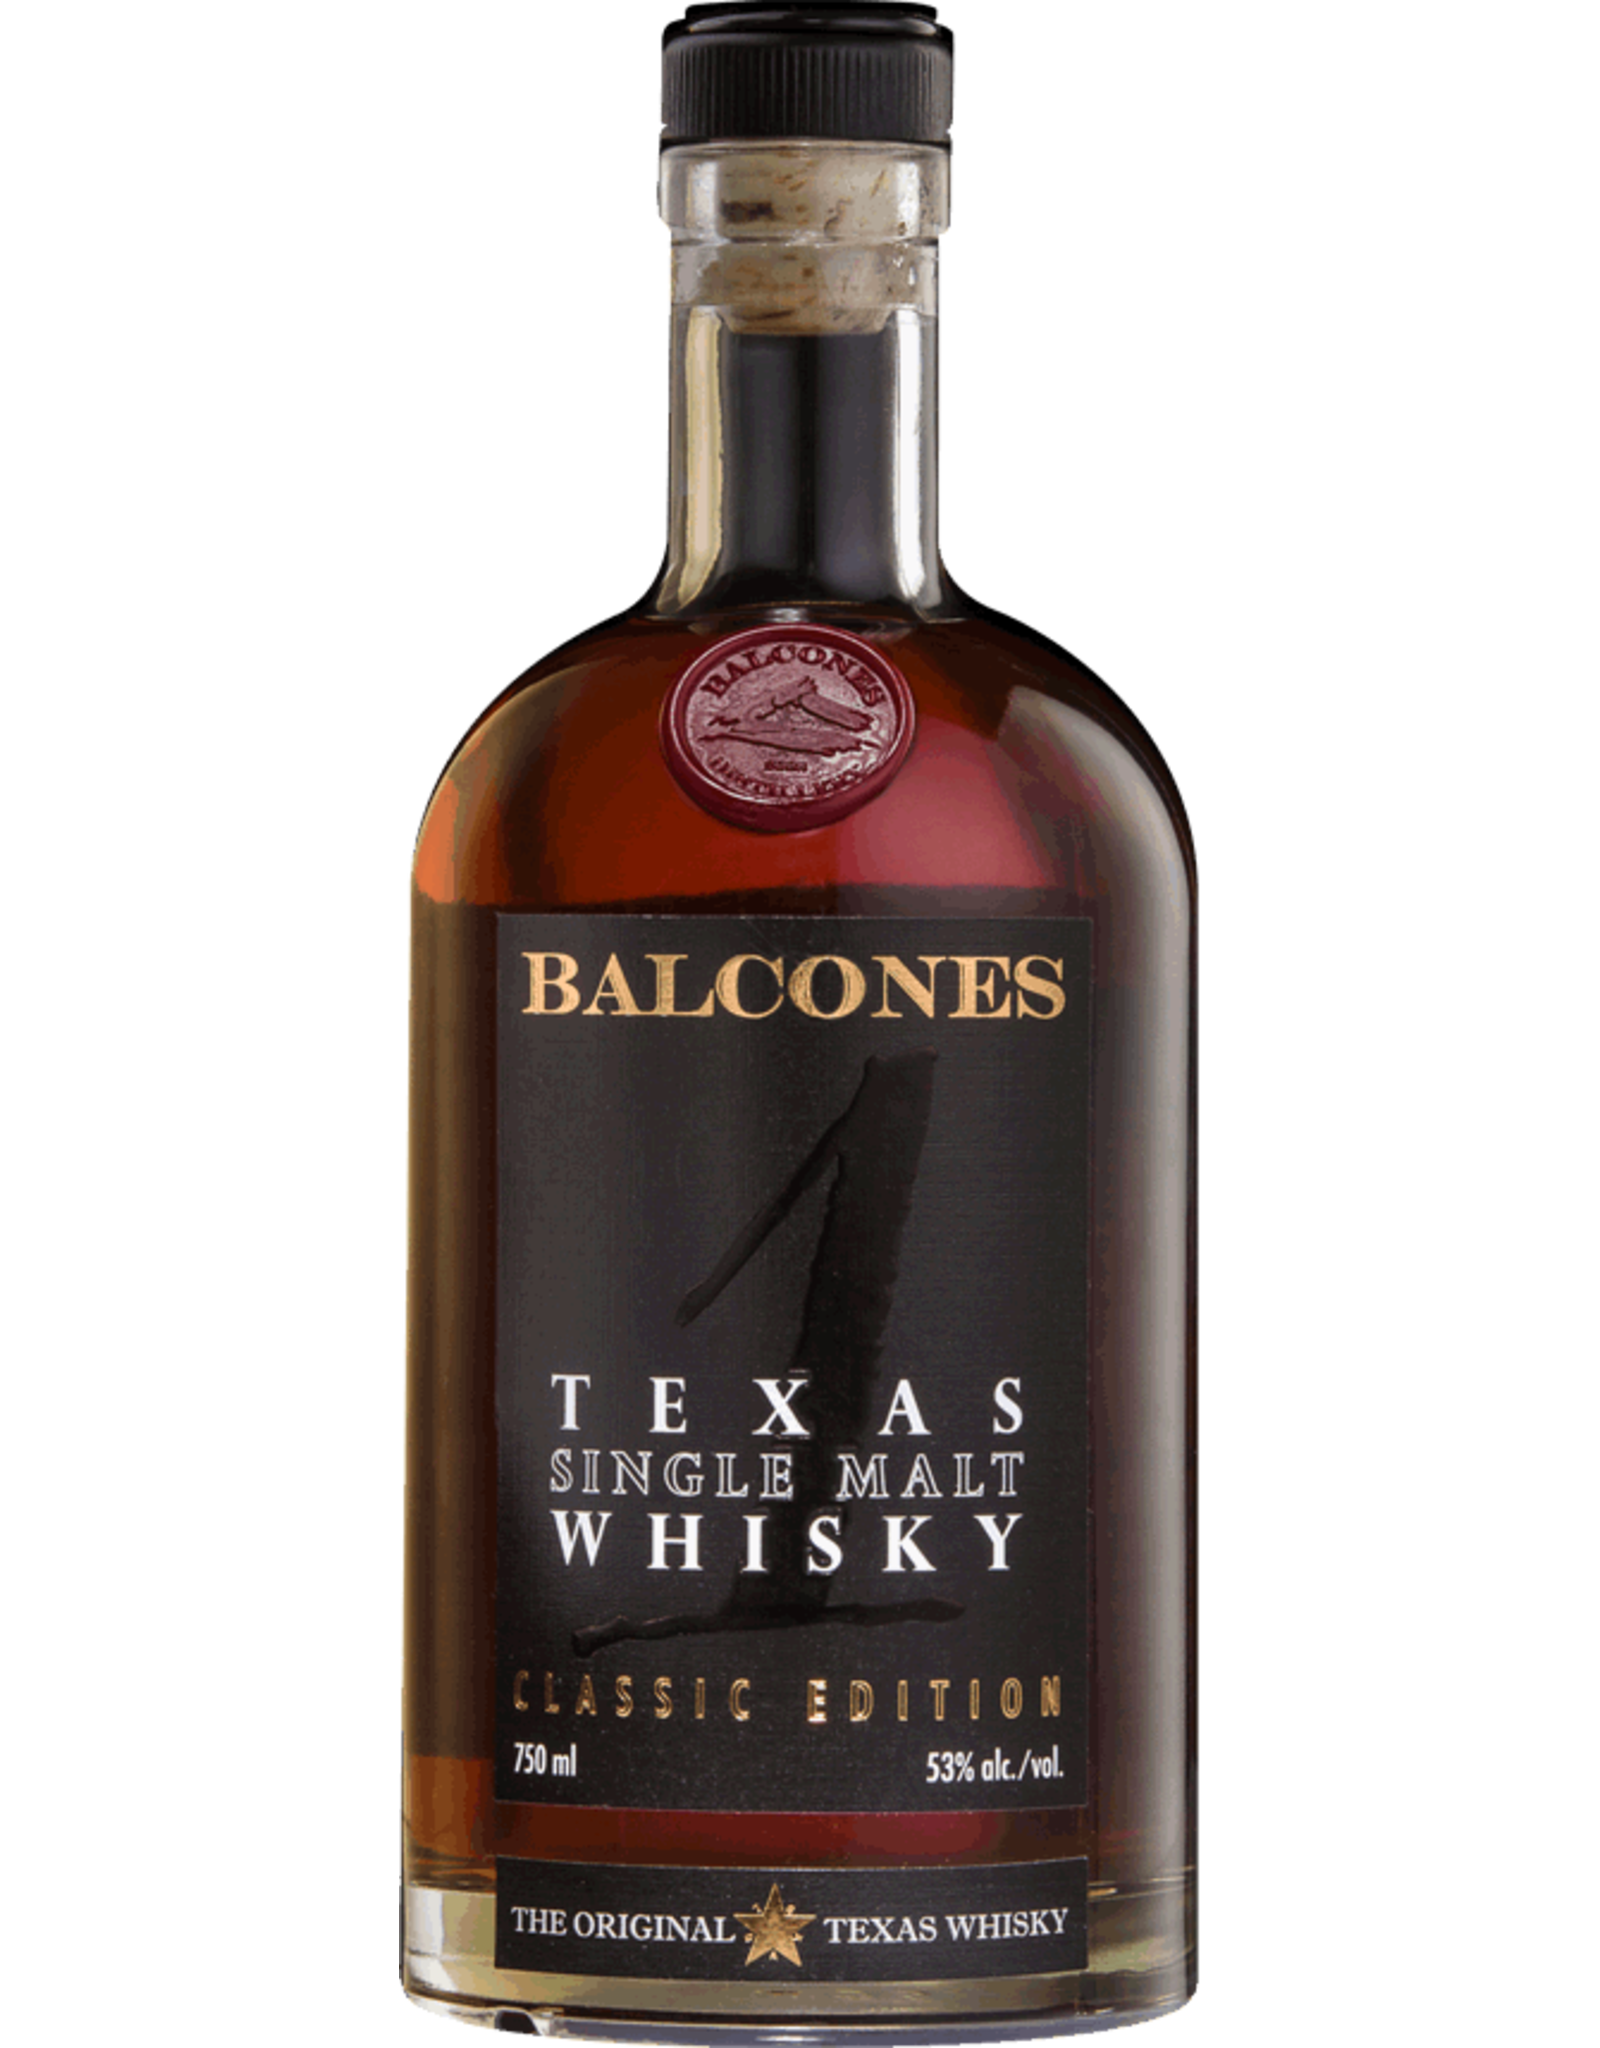 Balcones Single Malt